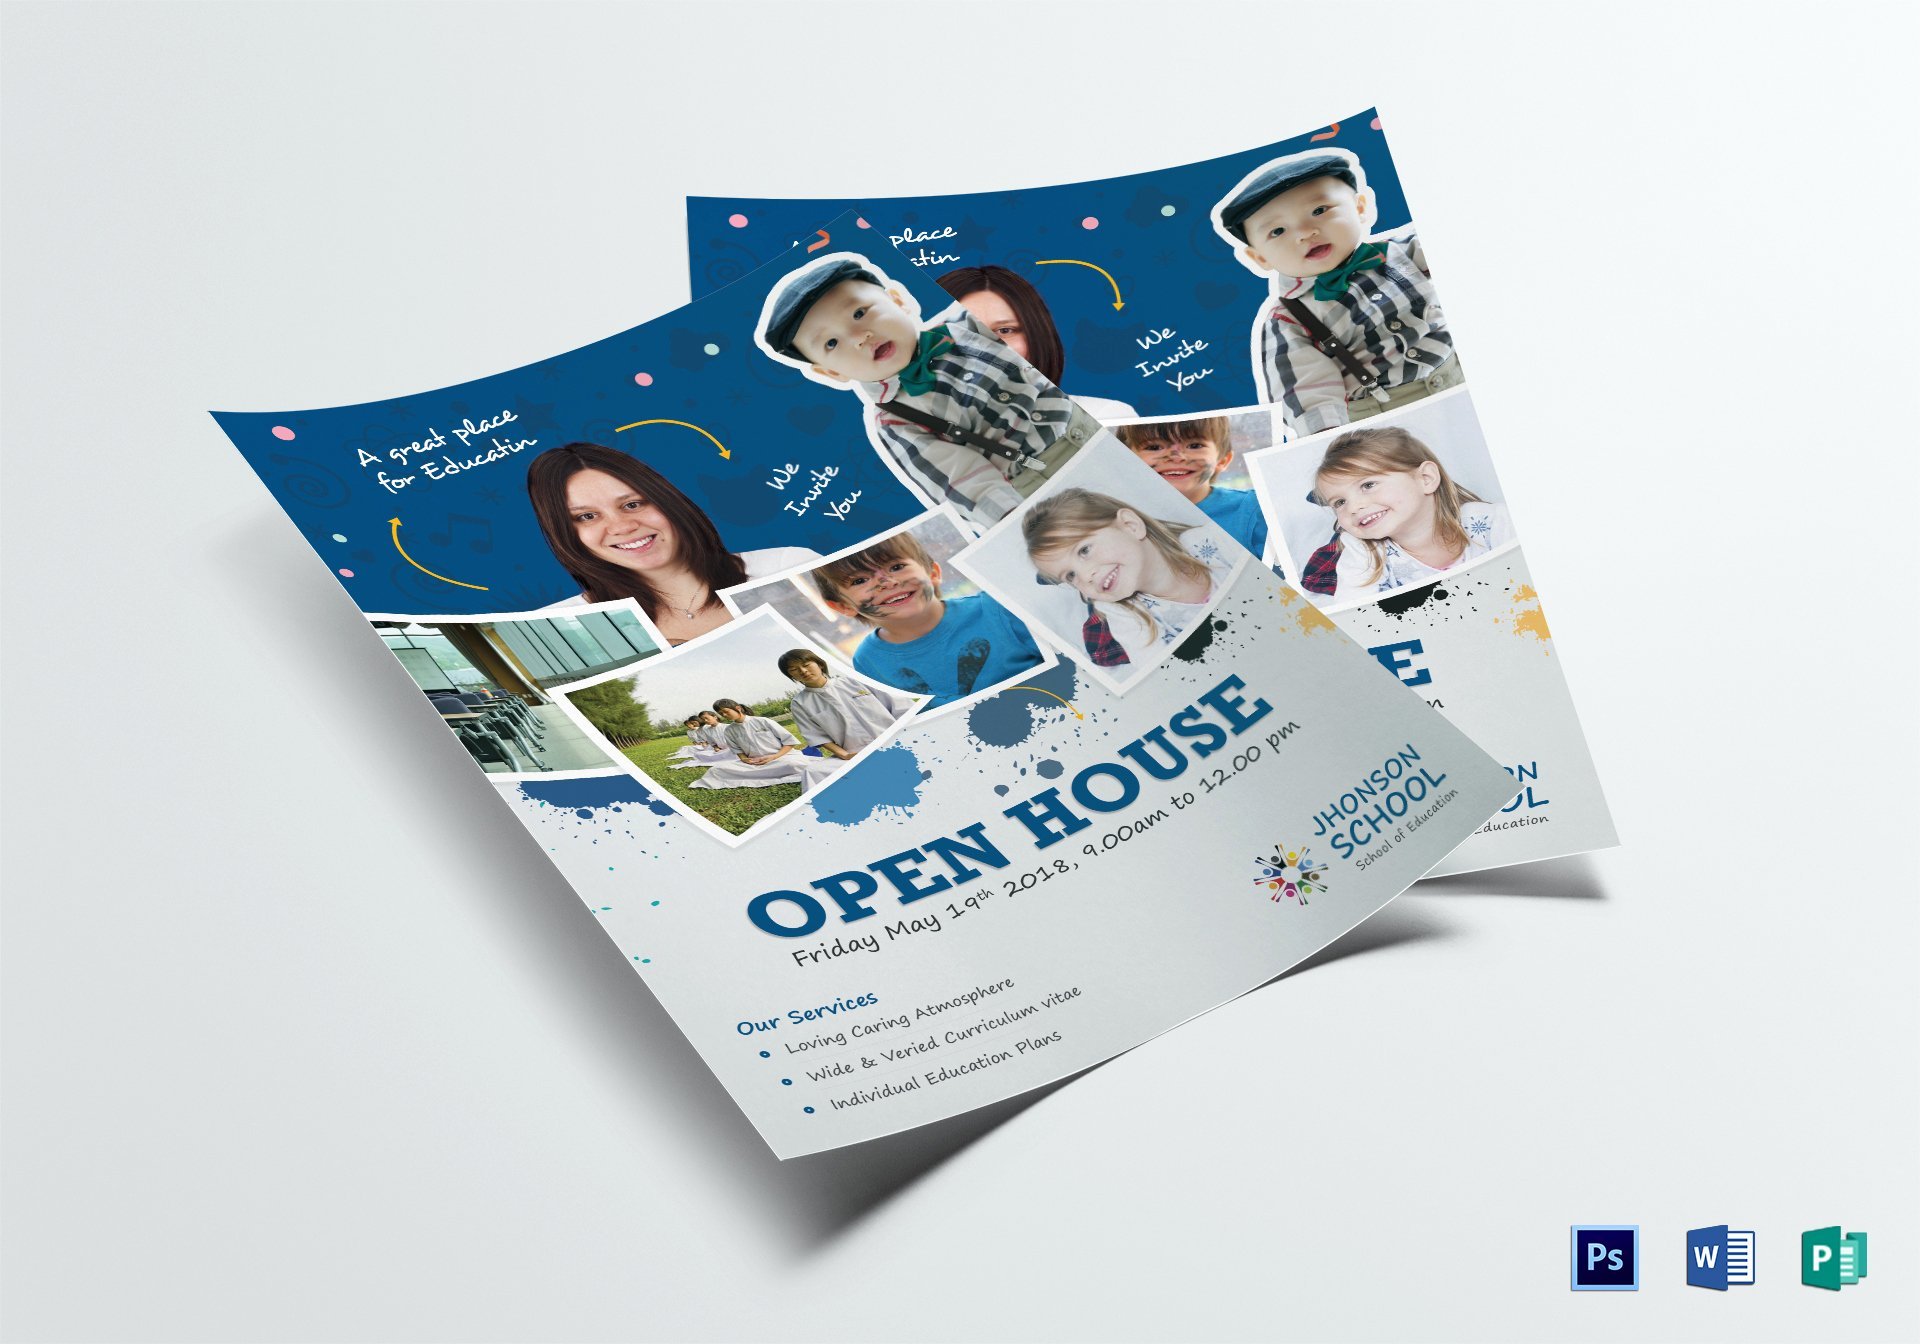 Open House Flyer Template Word Elegant Kids Open House Flyer Design Template In Psd Word Publisher